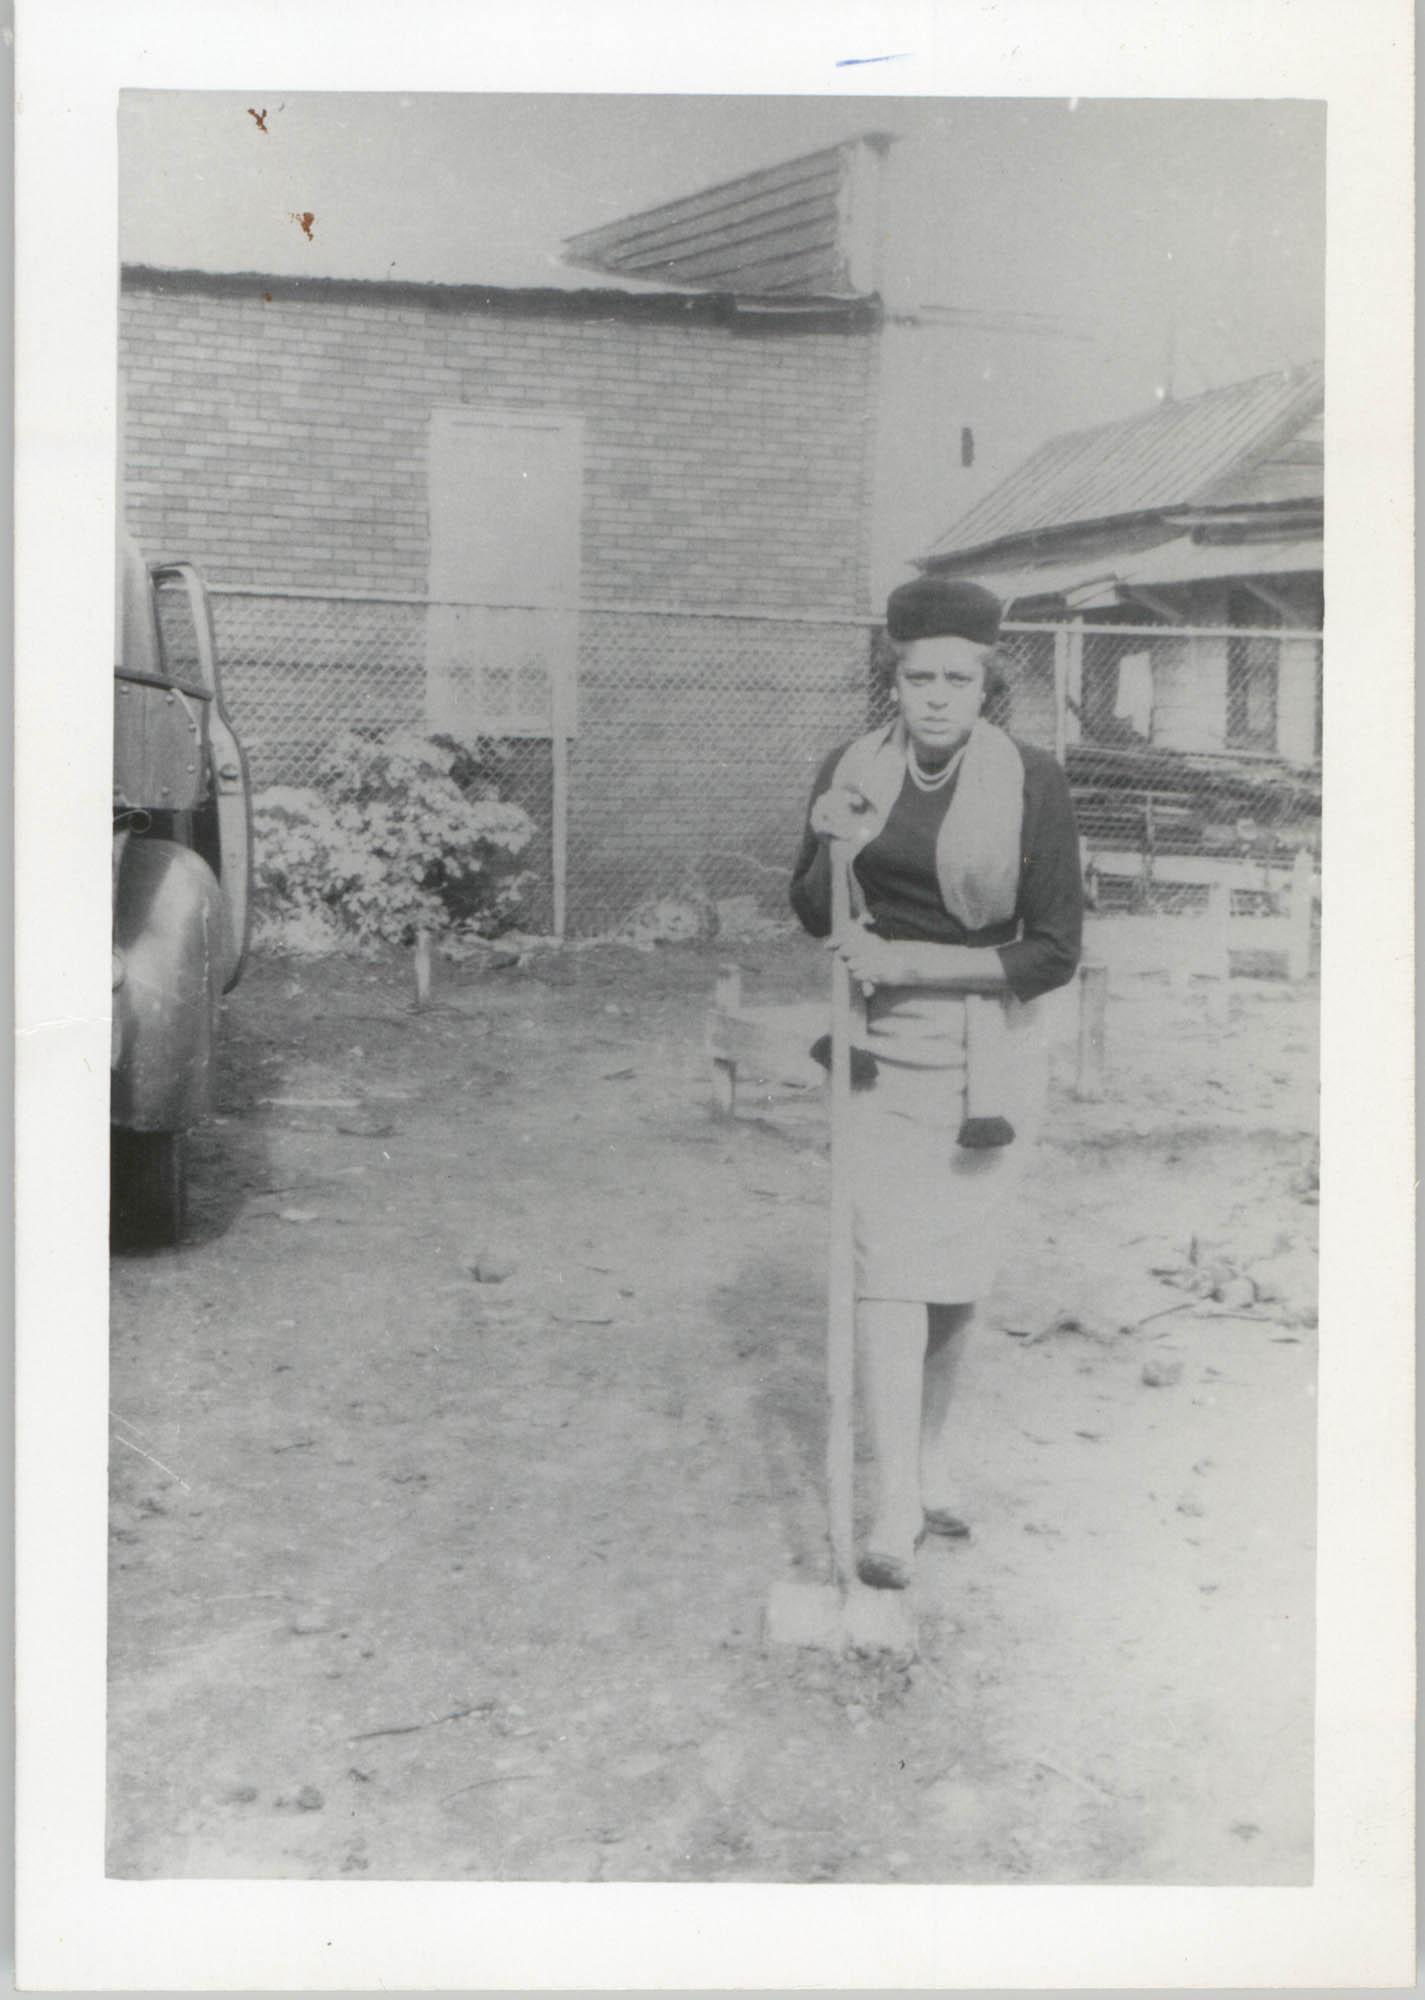 Photograph of Woman Shoveling